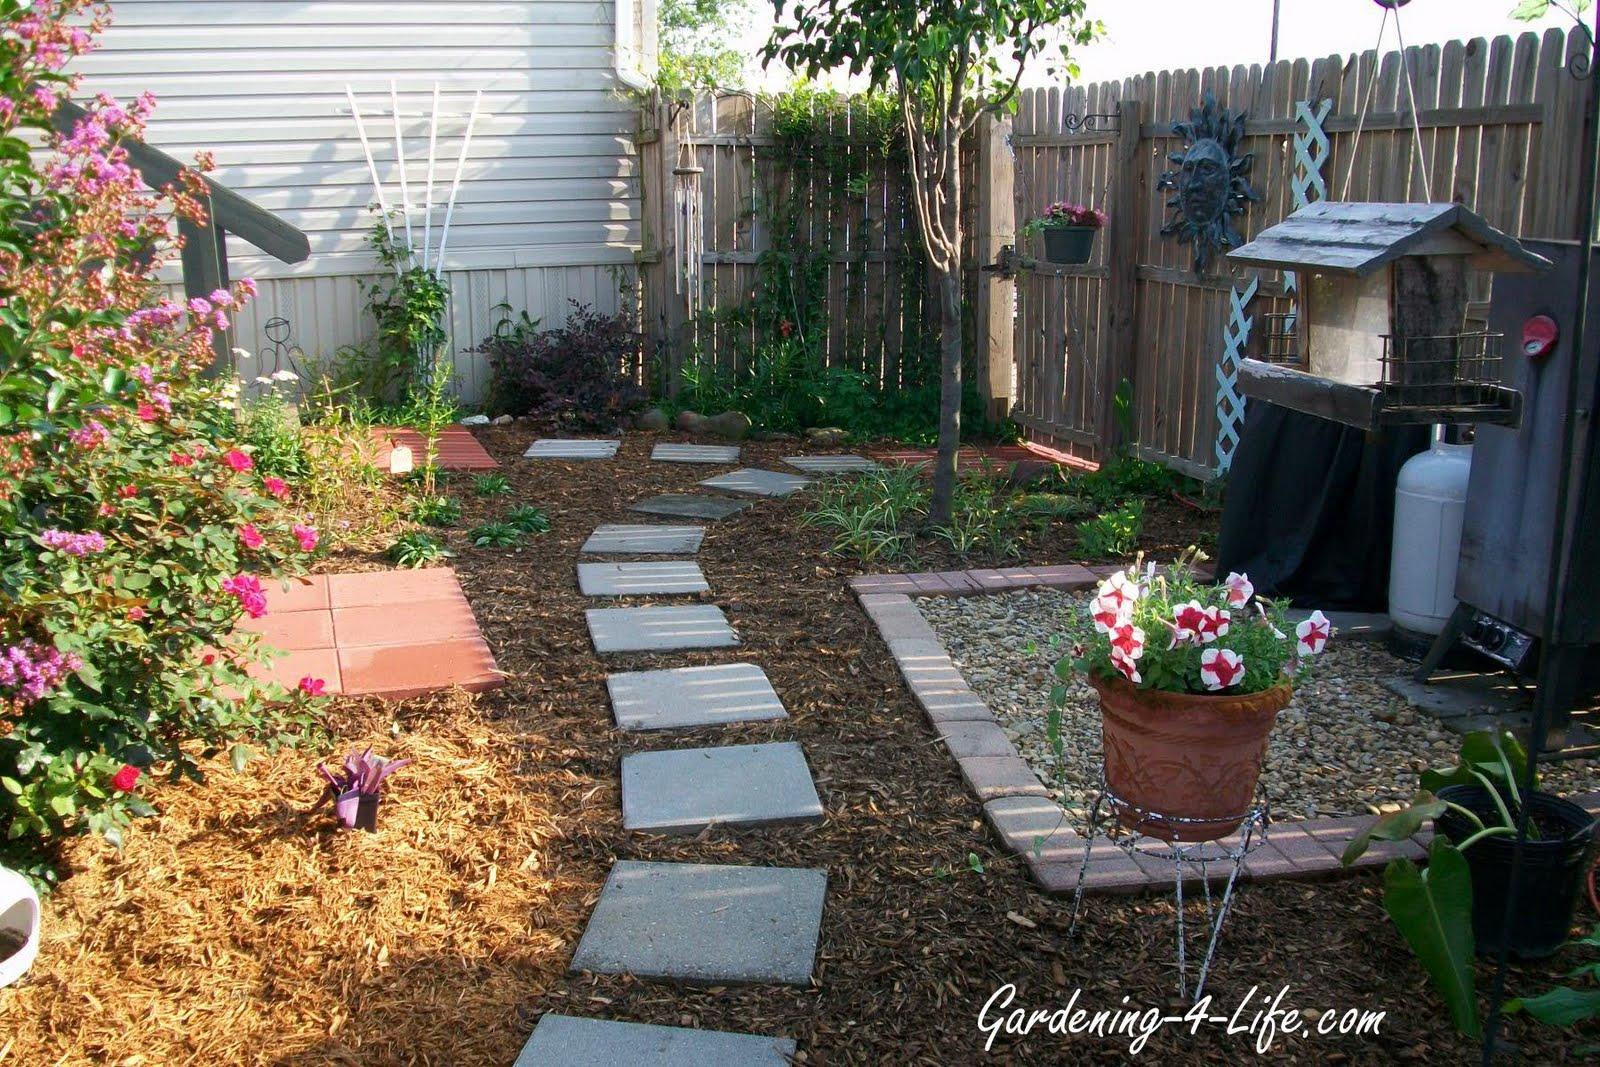 Gardening-4-Life: Backyard Makeover on Backyard Patio Makeover id=78665